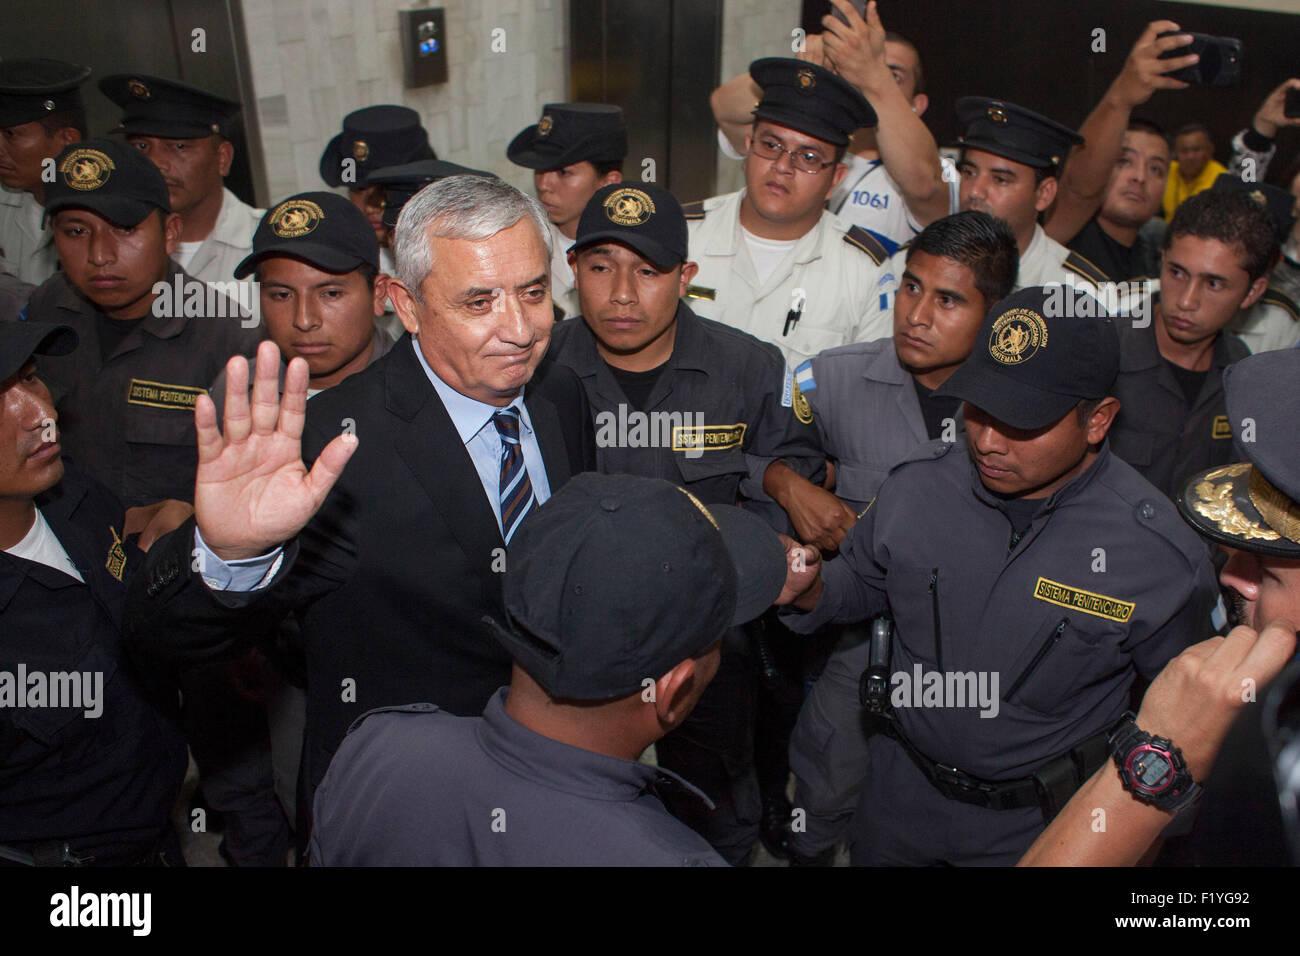 Guatemala City, Guatemala. 8th Sep, 2015. Former Guatemalan president Otto Perez Molina reacts at the end of a hearing - Stock Image